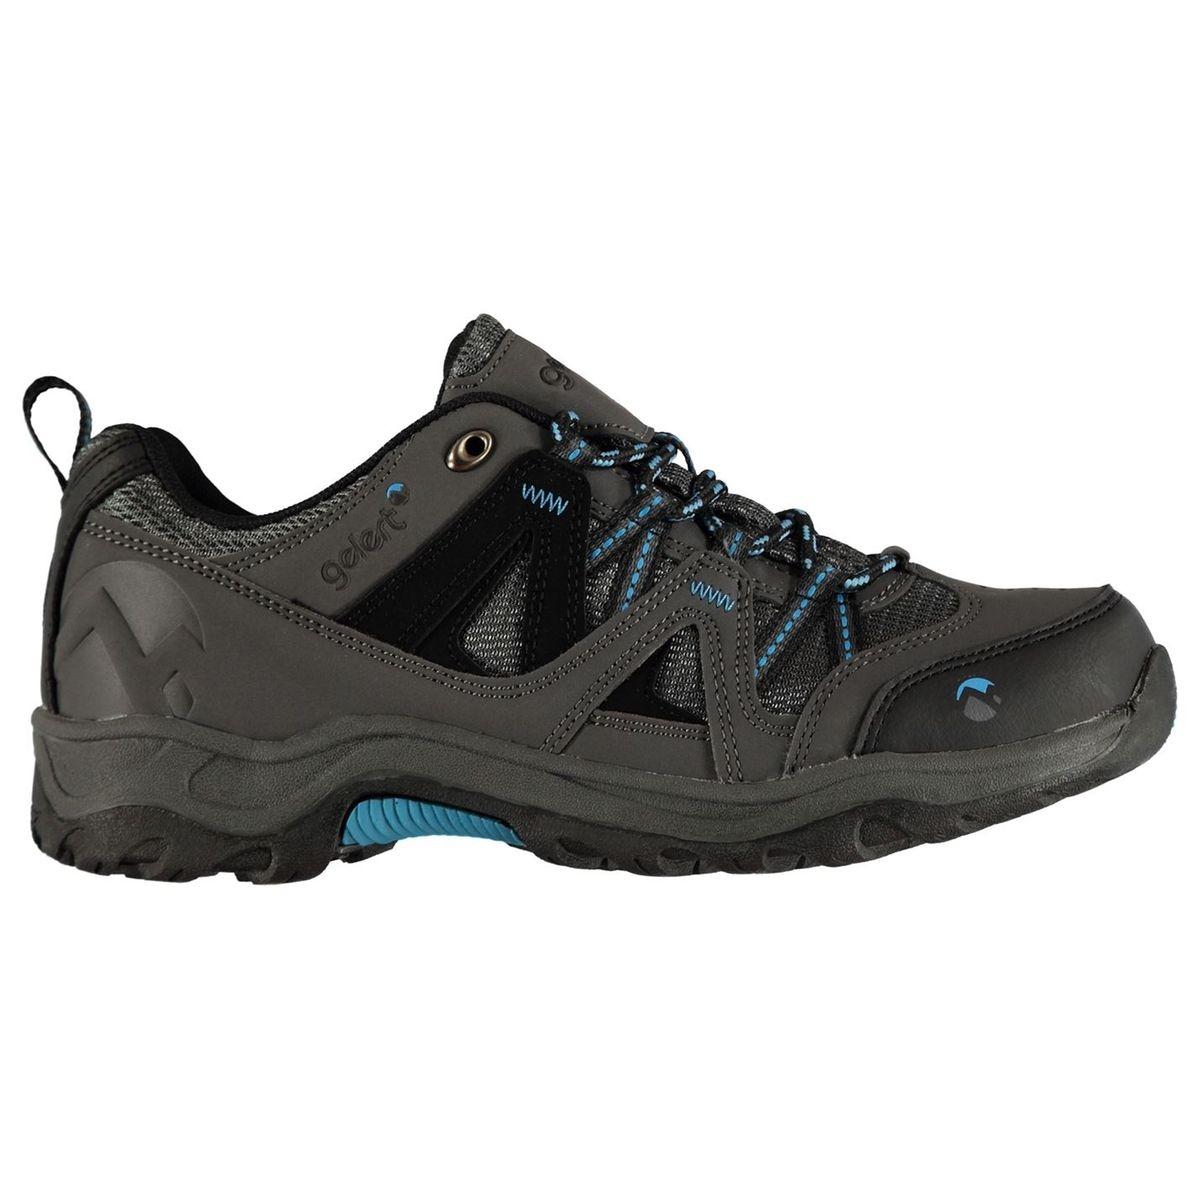 Chaussures de marche amorti